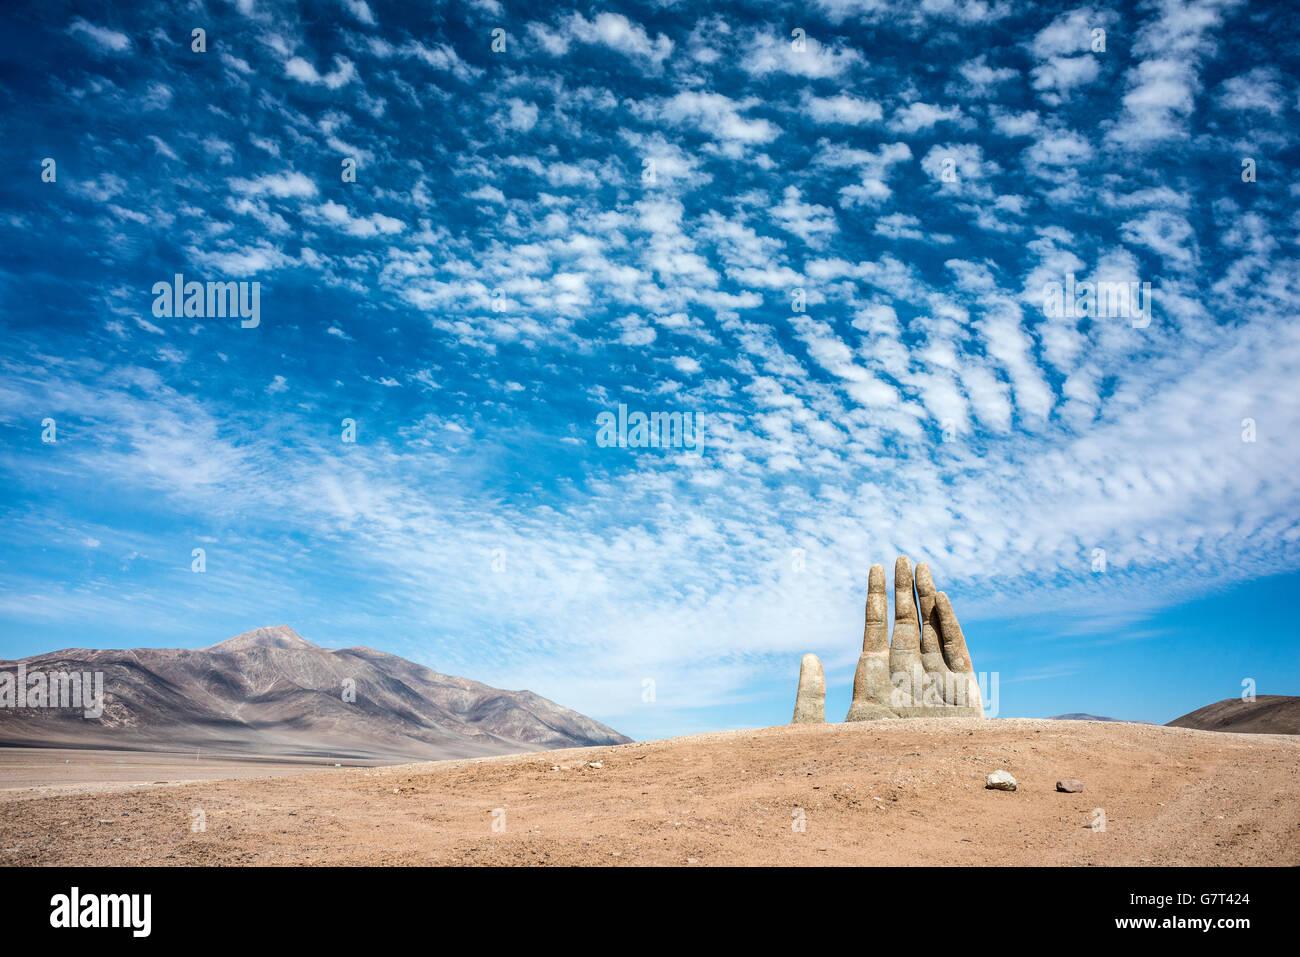 Hand Skulptur, das Symbol der Atacama-Wüste in Chile Stockbild